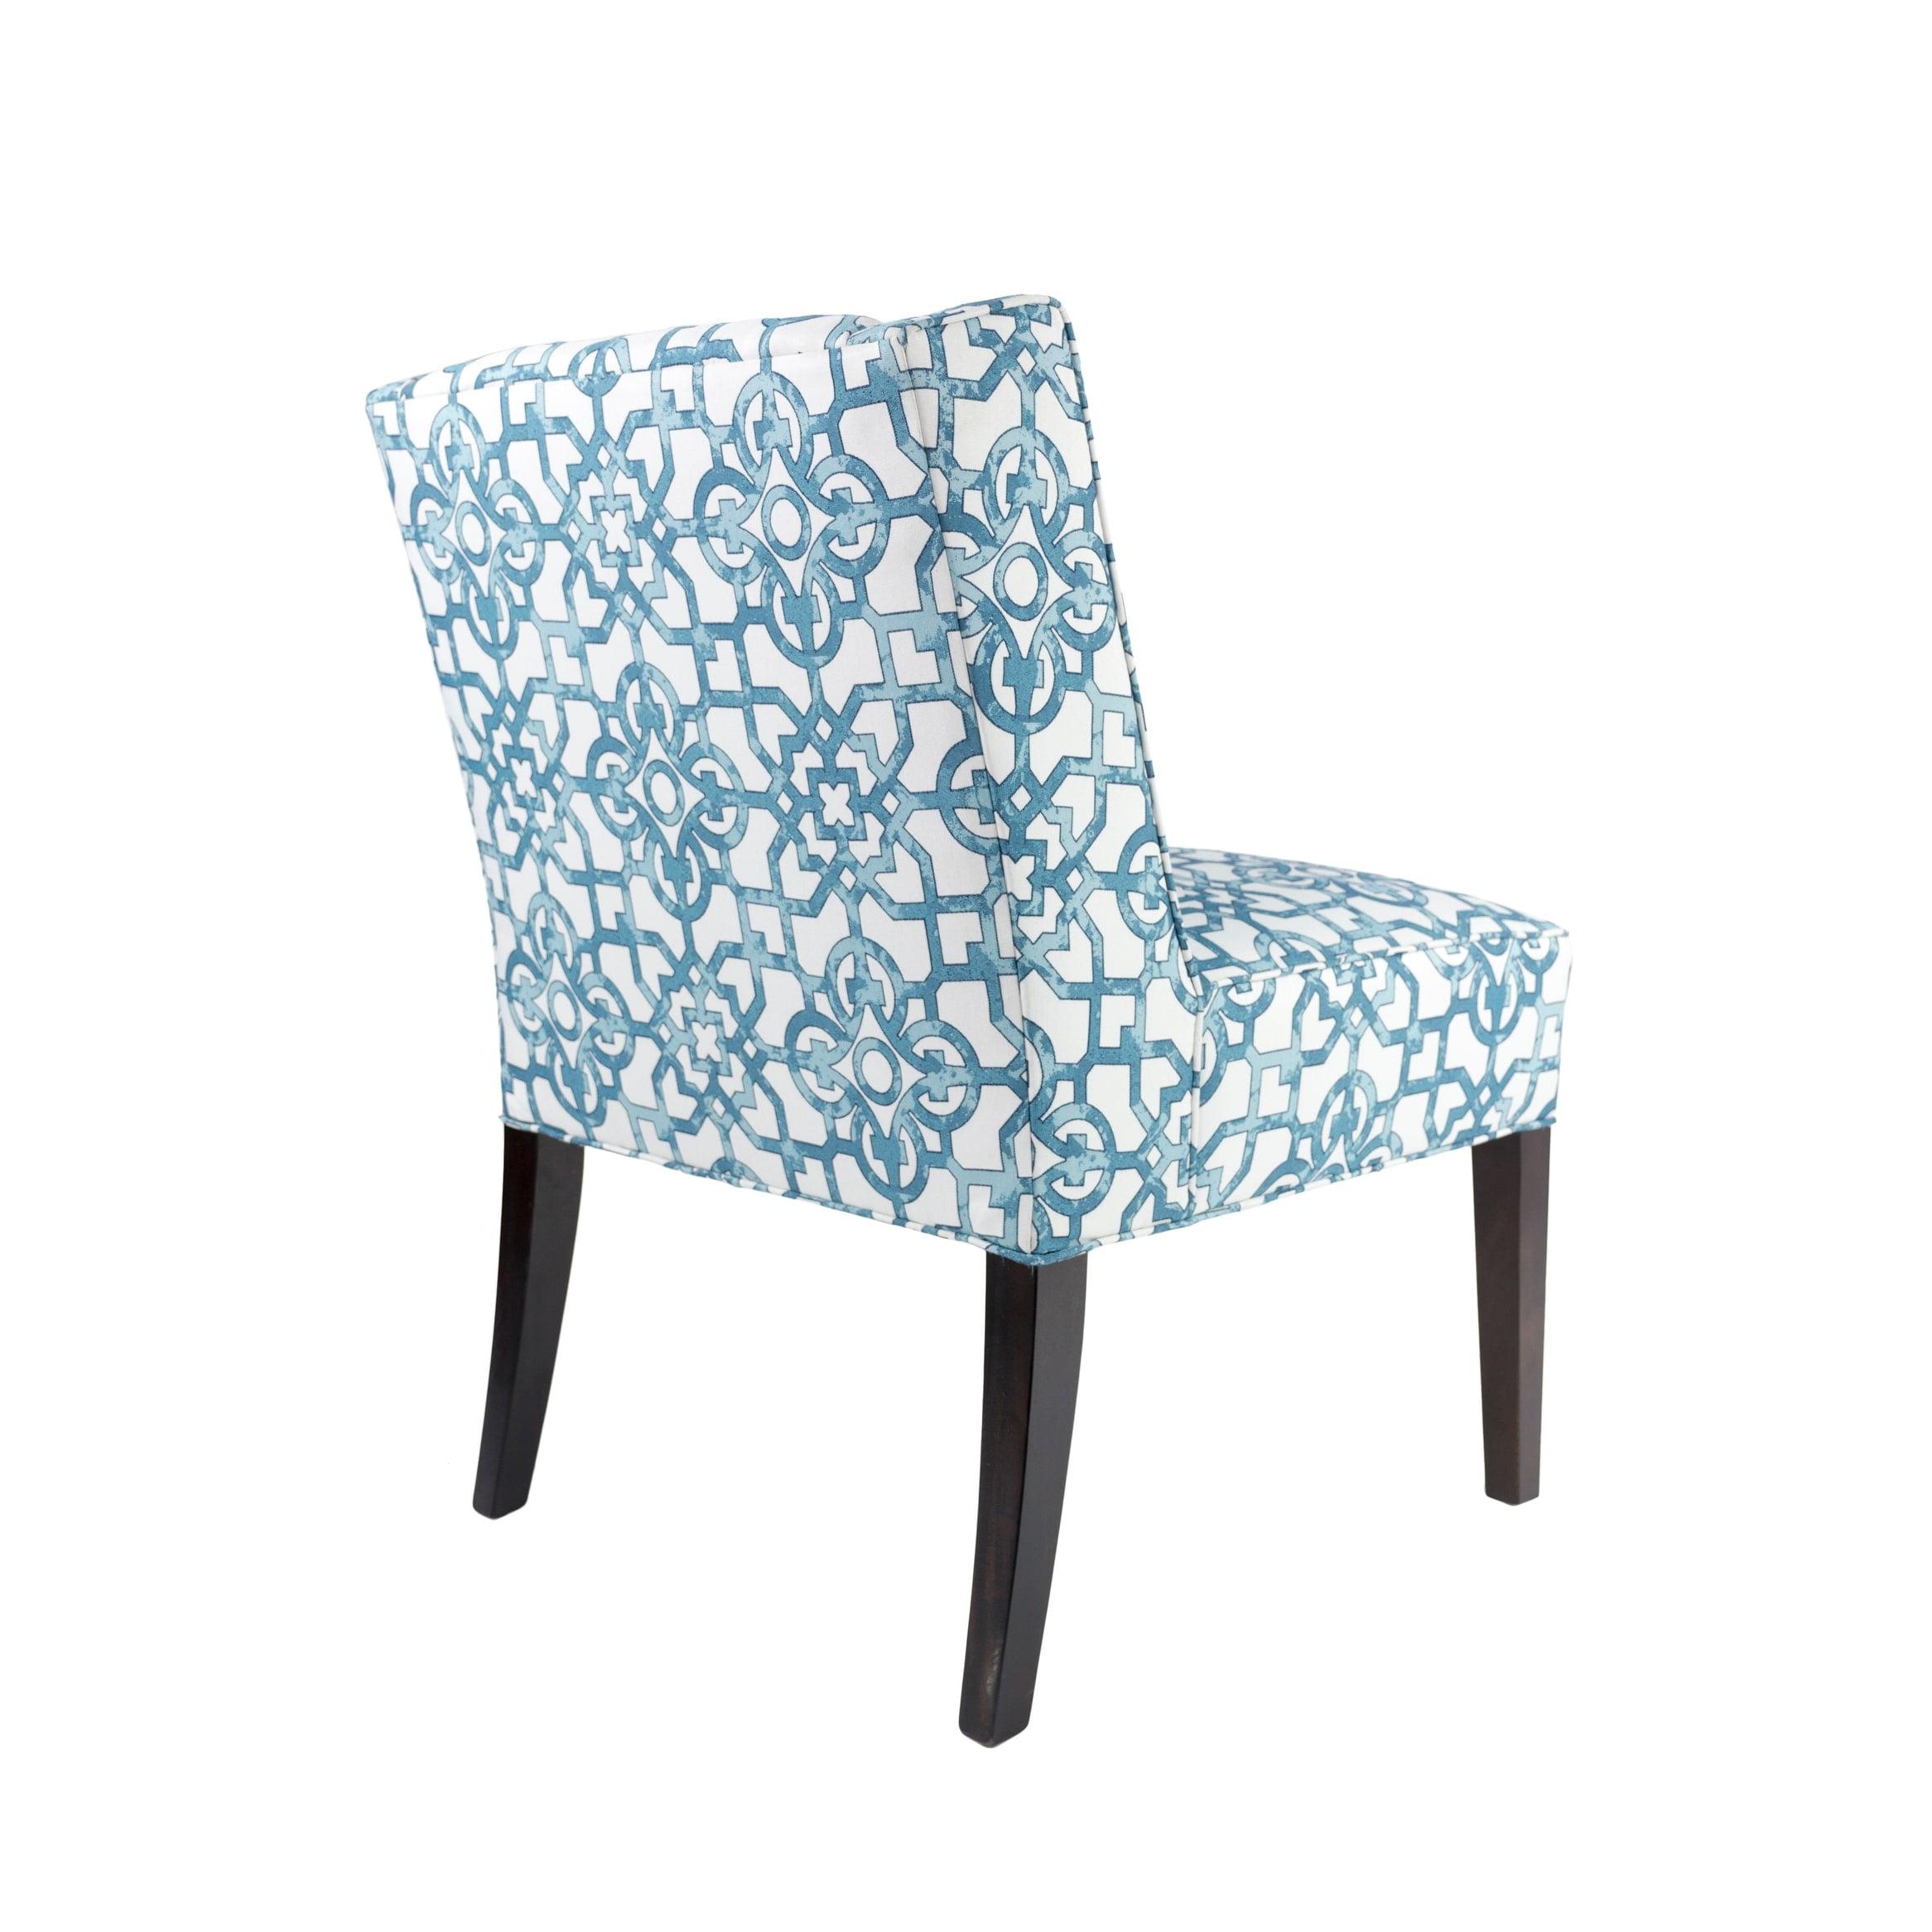 Sole Designs Nolani Modern Fabric M9831 Upholstered